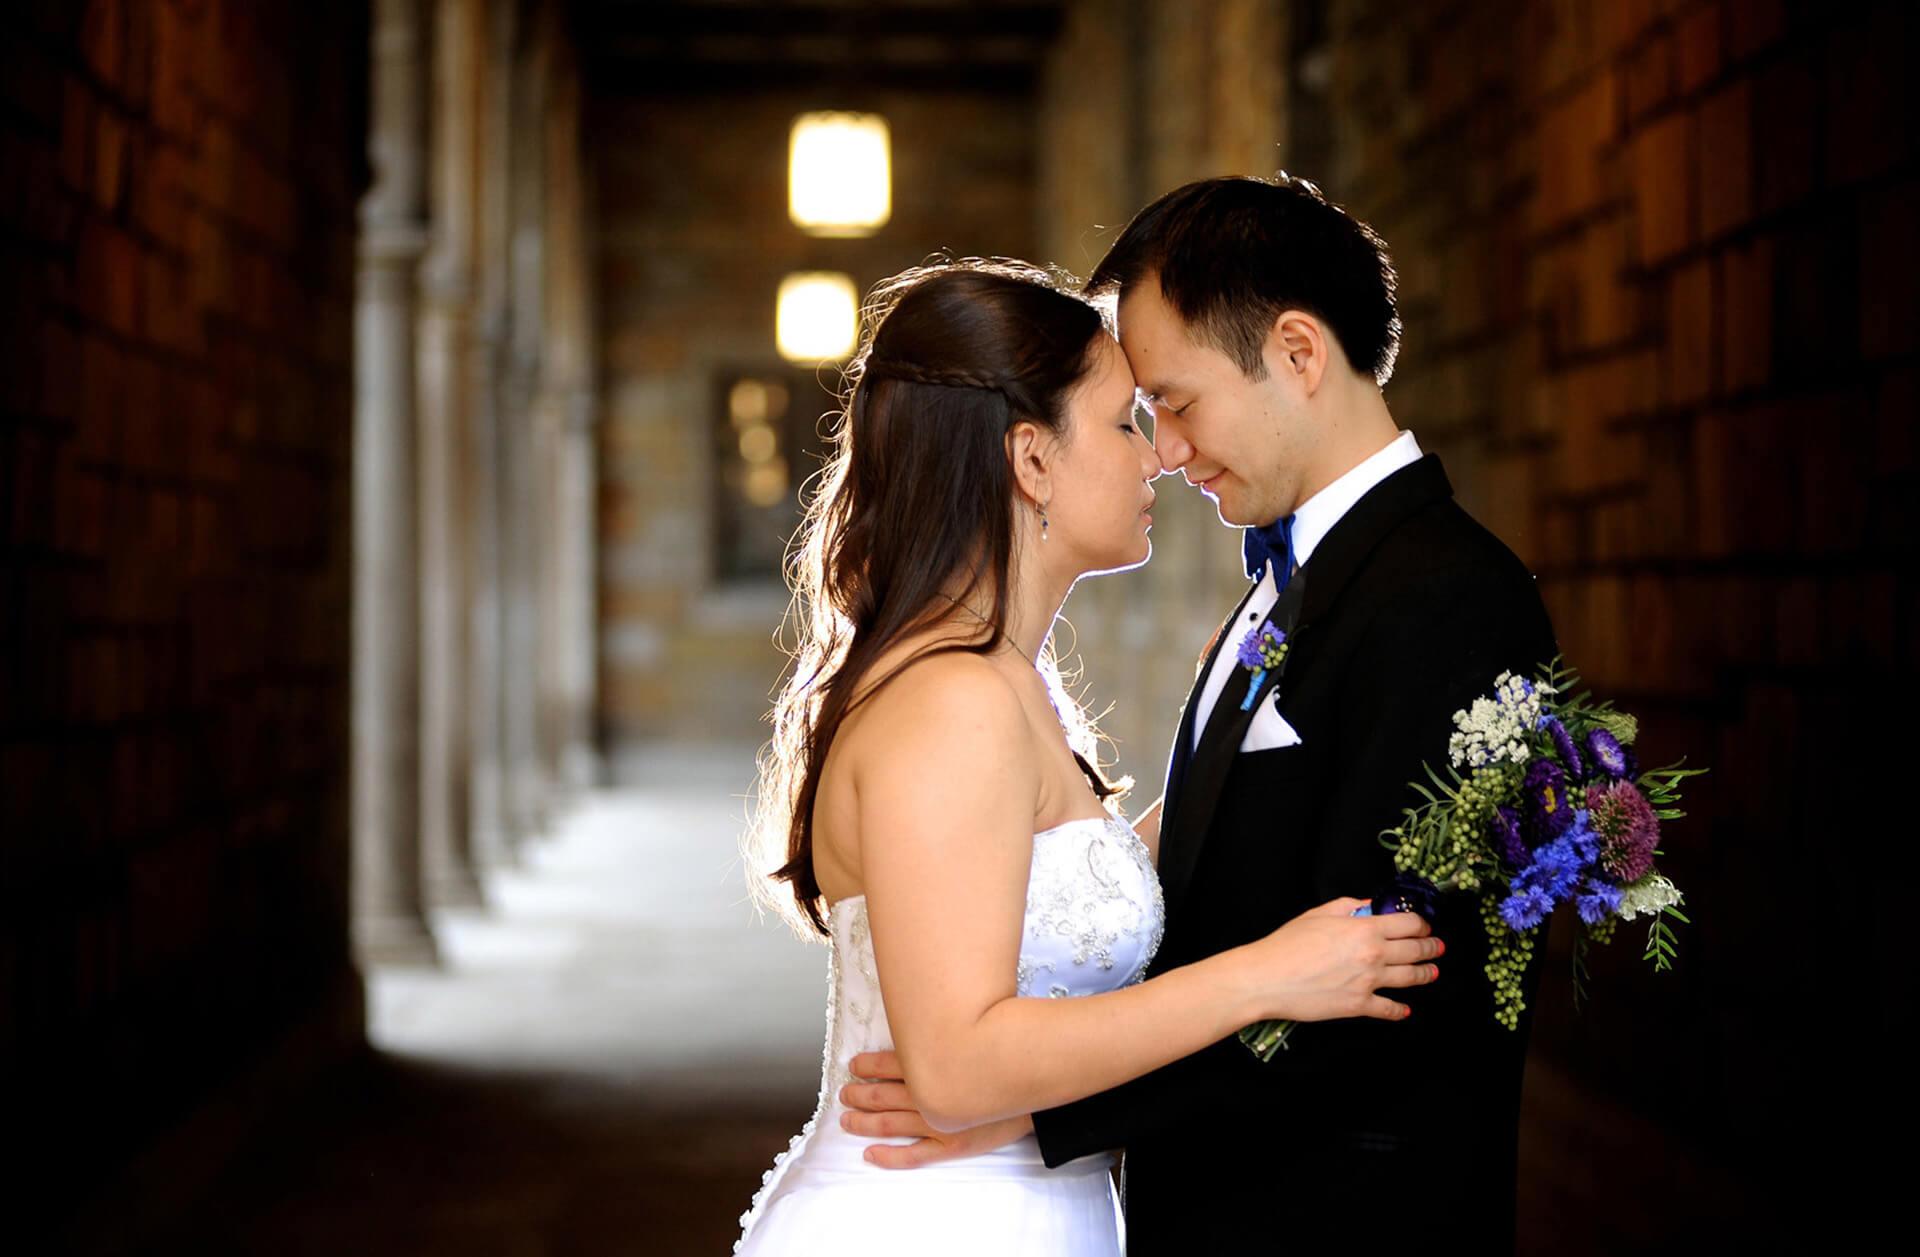 Michigan wedding photographer takes a photo of an Ann Arbor couples posing for photos a year after their Ann Arbor wedding.